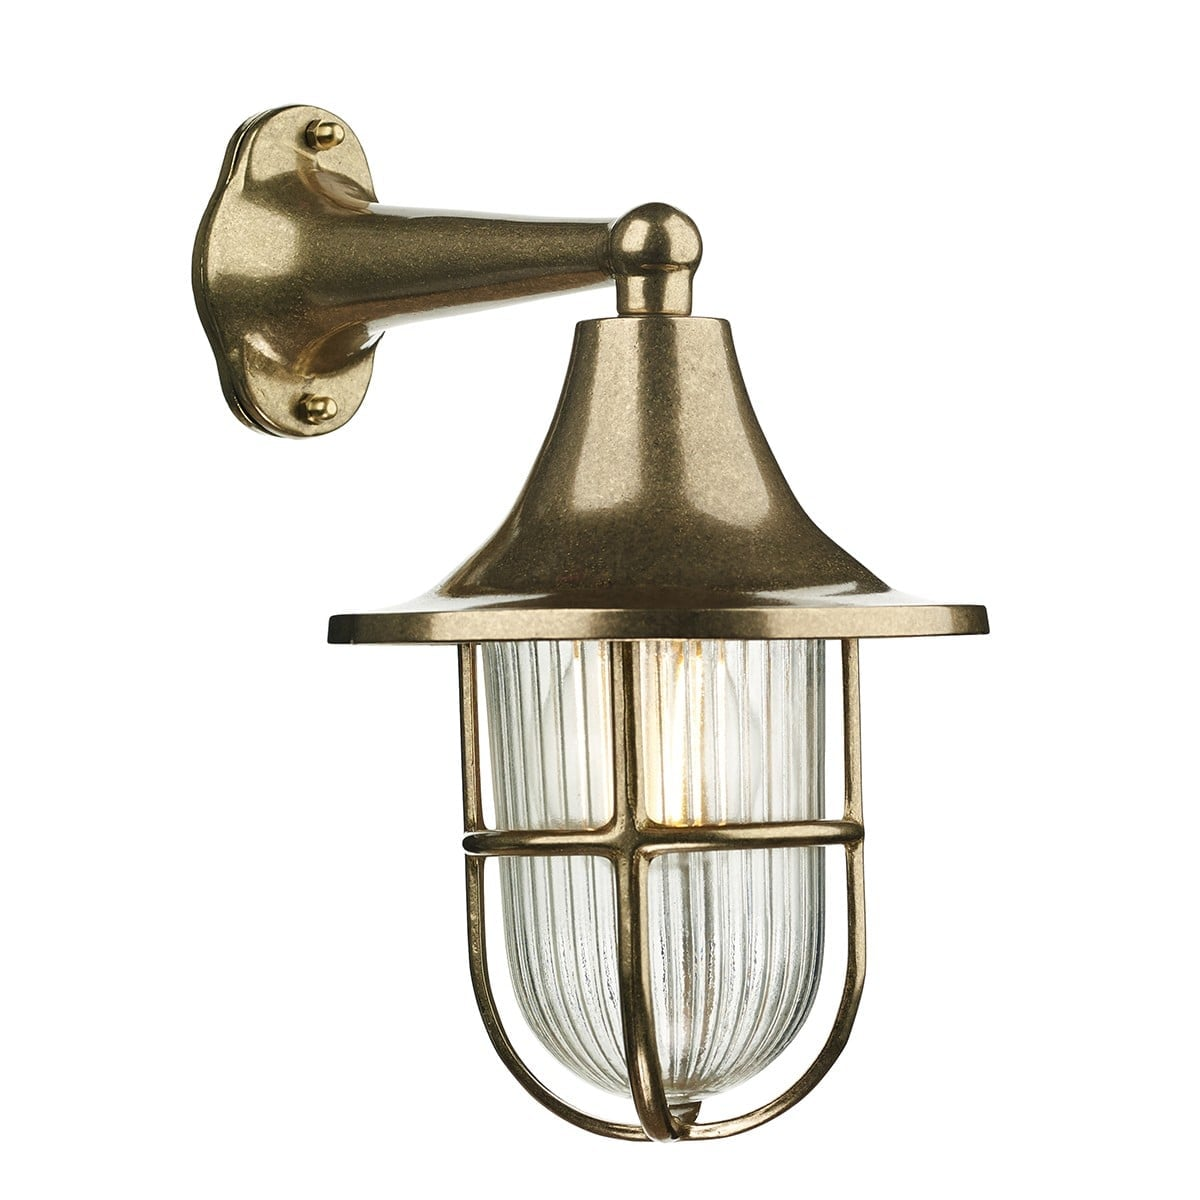 David Hunt Lighting WAD1540 Wadebridge 1 light wall light, Brass